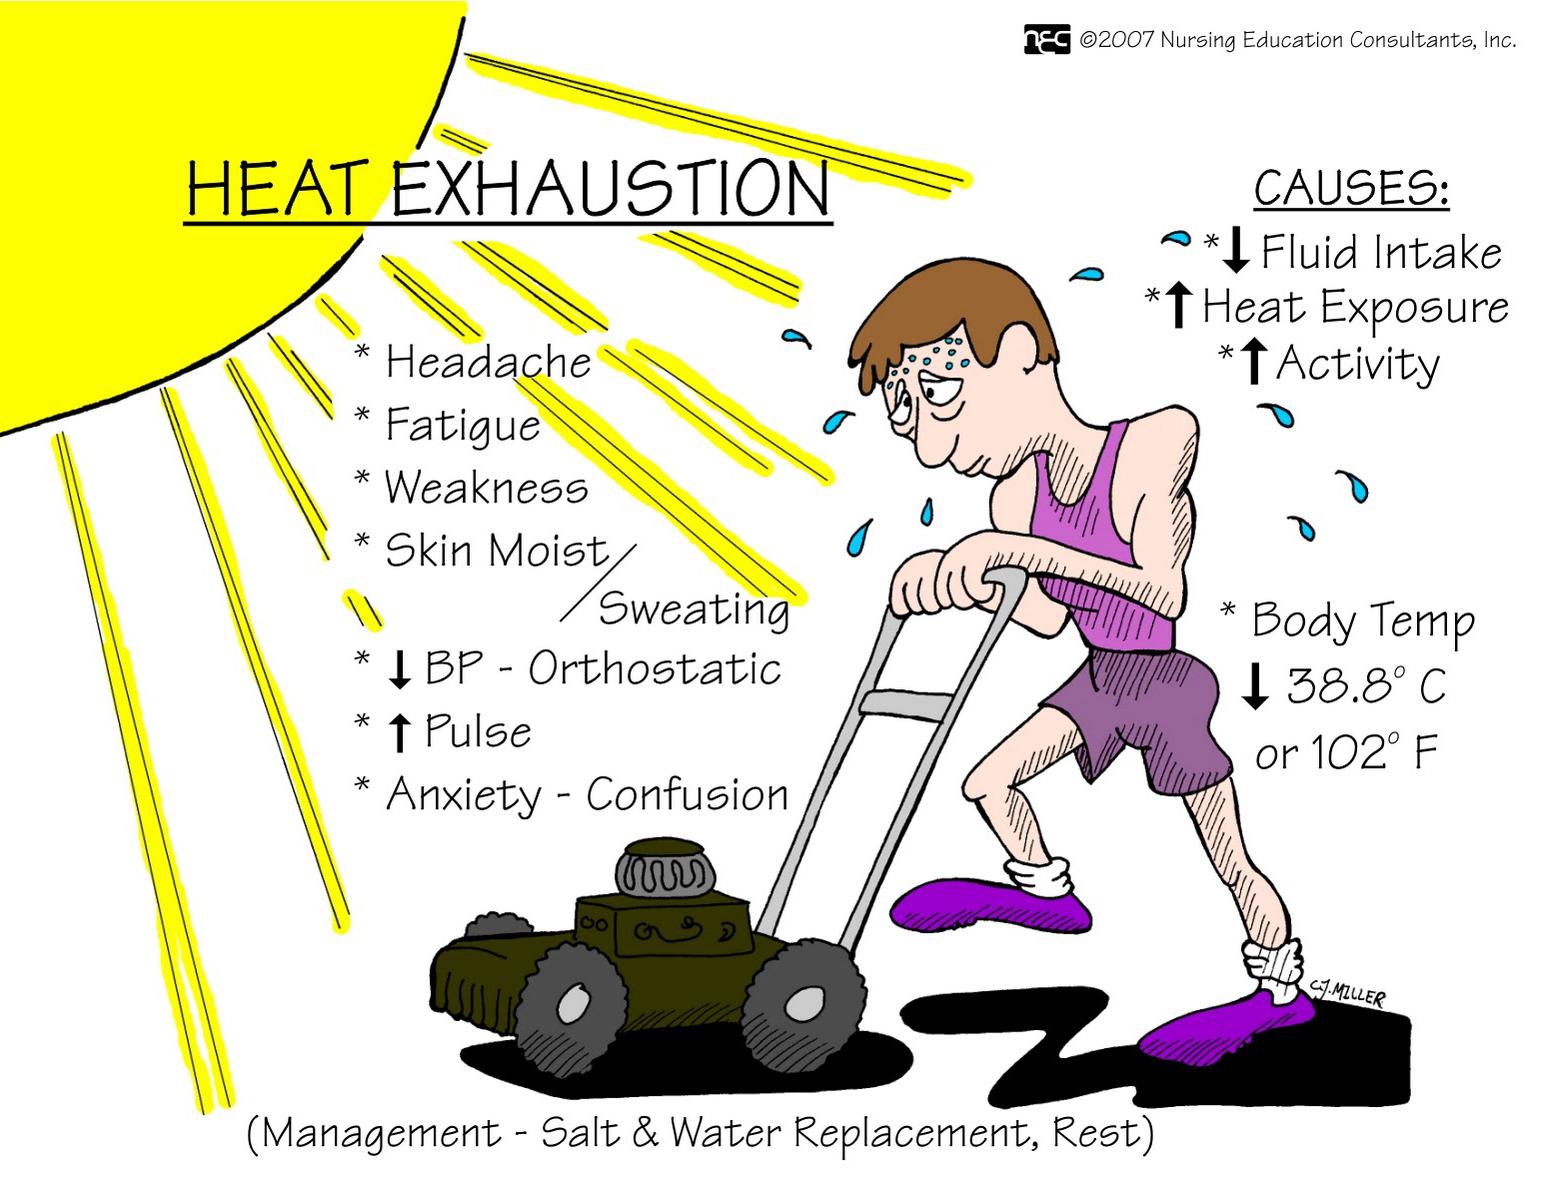 symptoms-of-heat-exhaustion.jpg